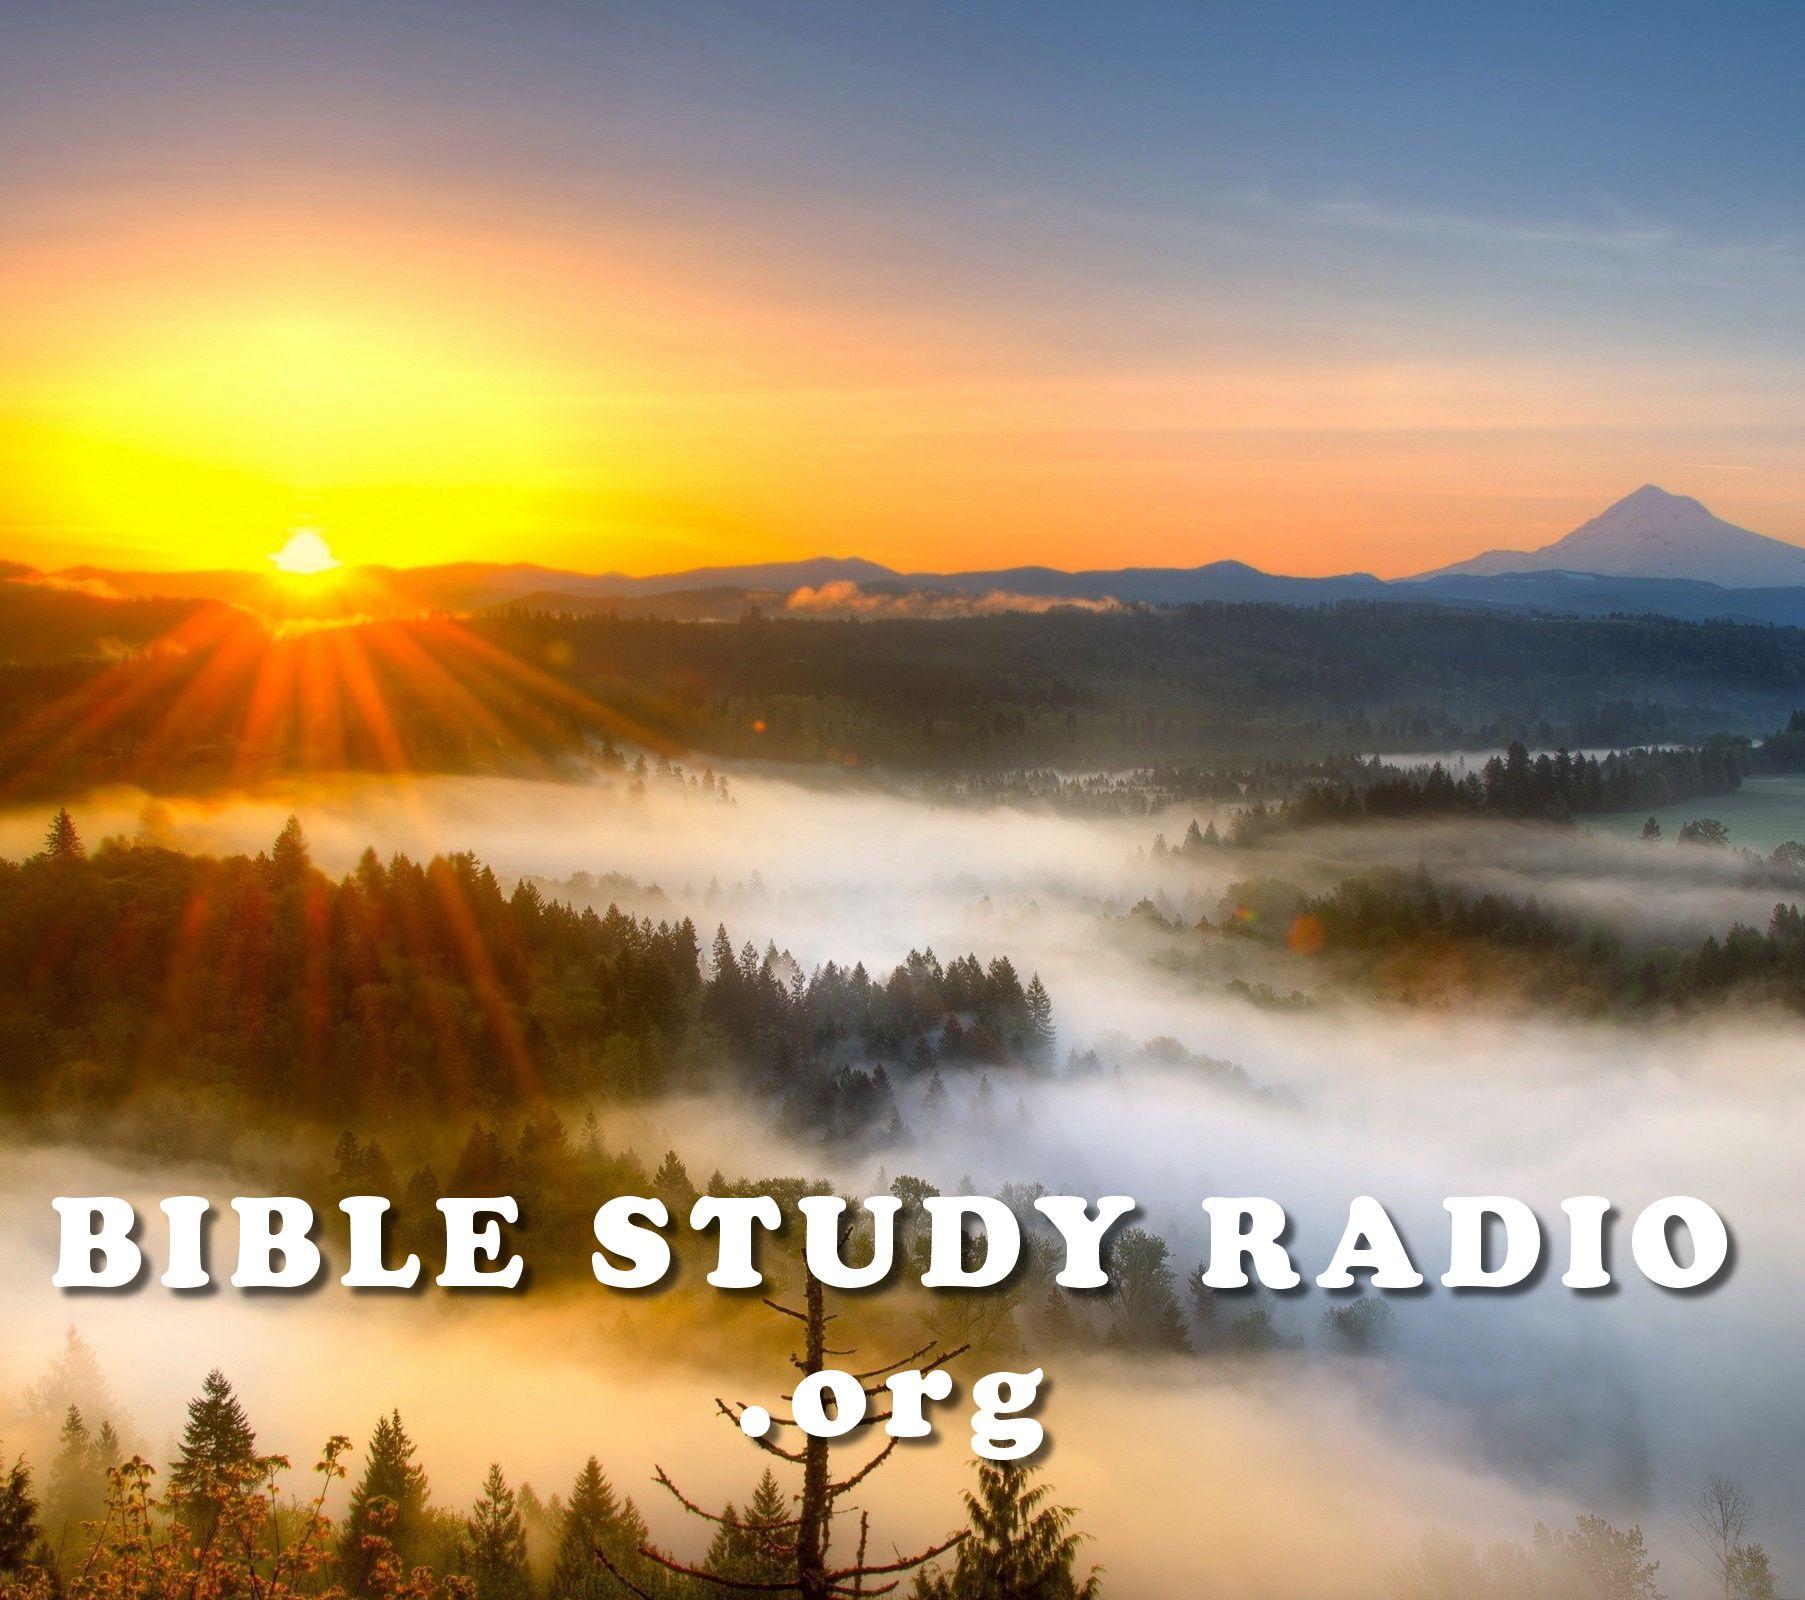 Bible Study Radio